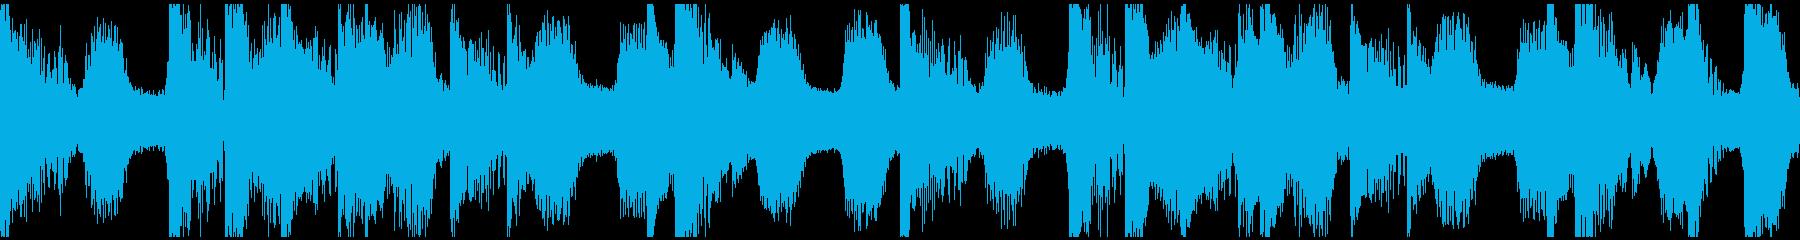 Dubstep bpm140Loopの再生済みの波形